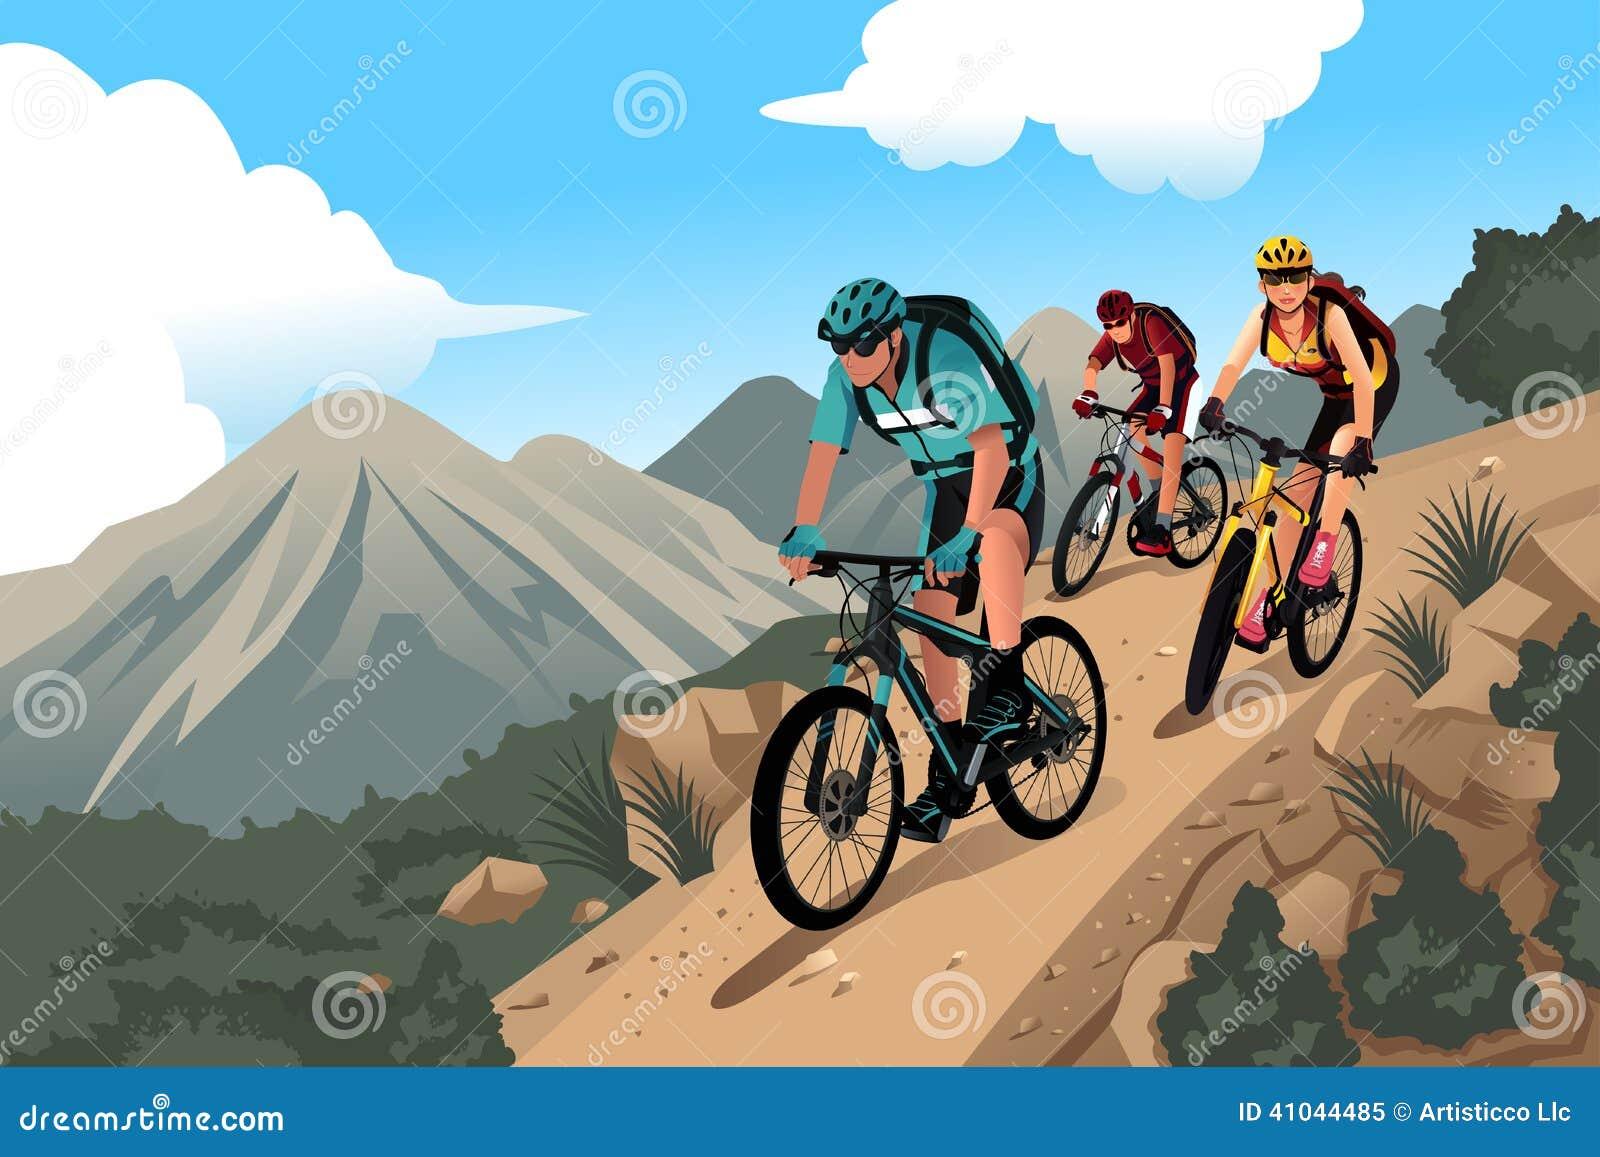 Mountain Bikers In The Stock Vector